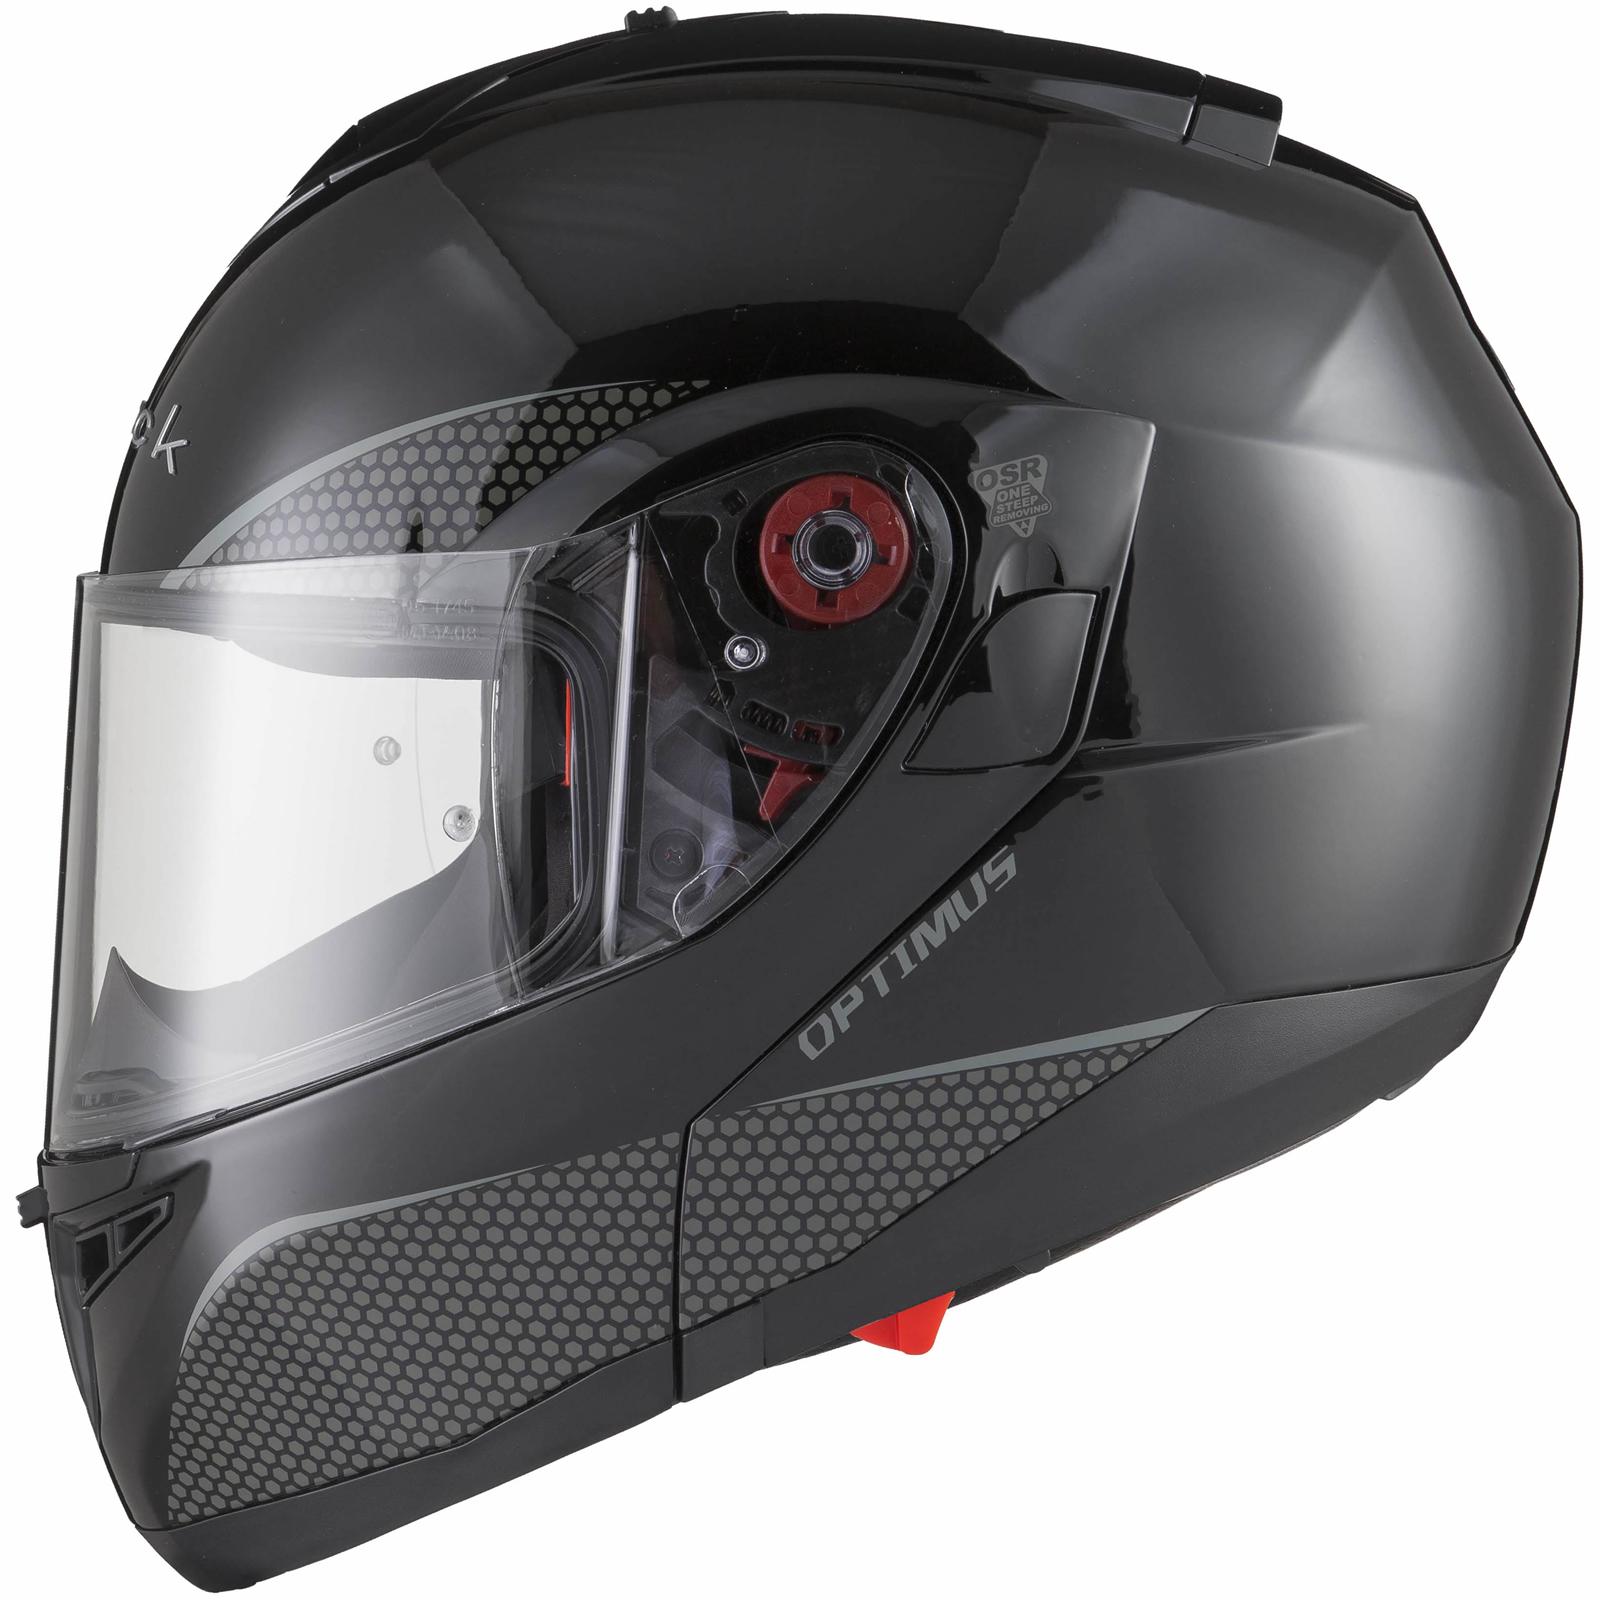 Black-Optimus-SV-Max-Vision-Flip-Up-Front-Motorcycle-Helmet-Pinlock-Ready-Visor thumbnail 17